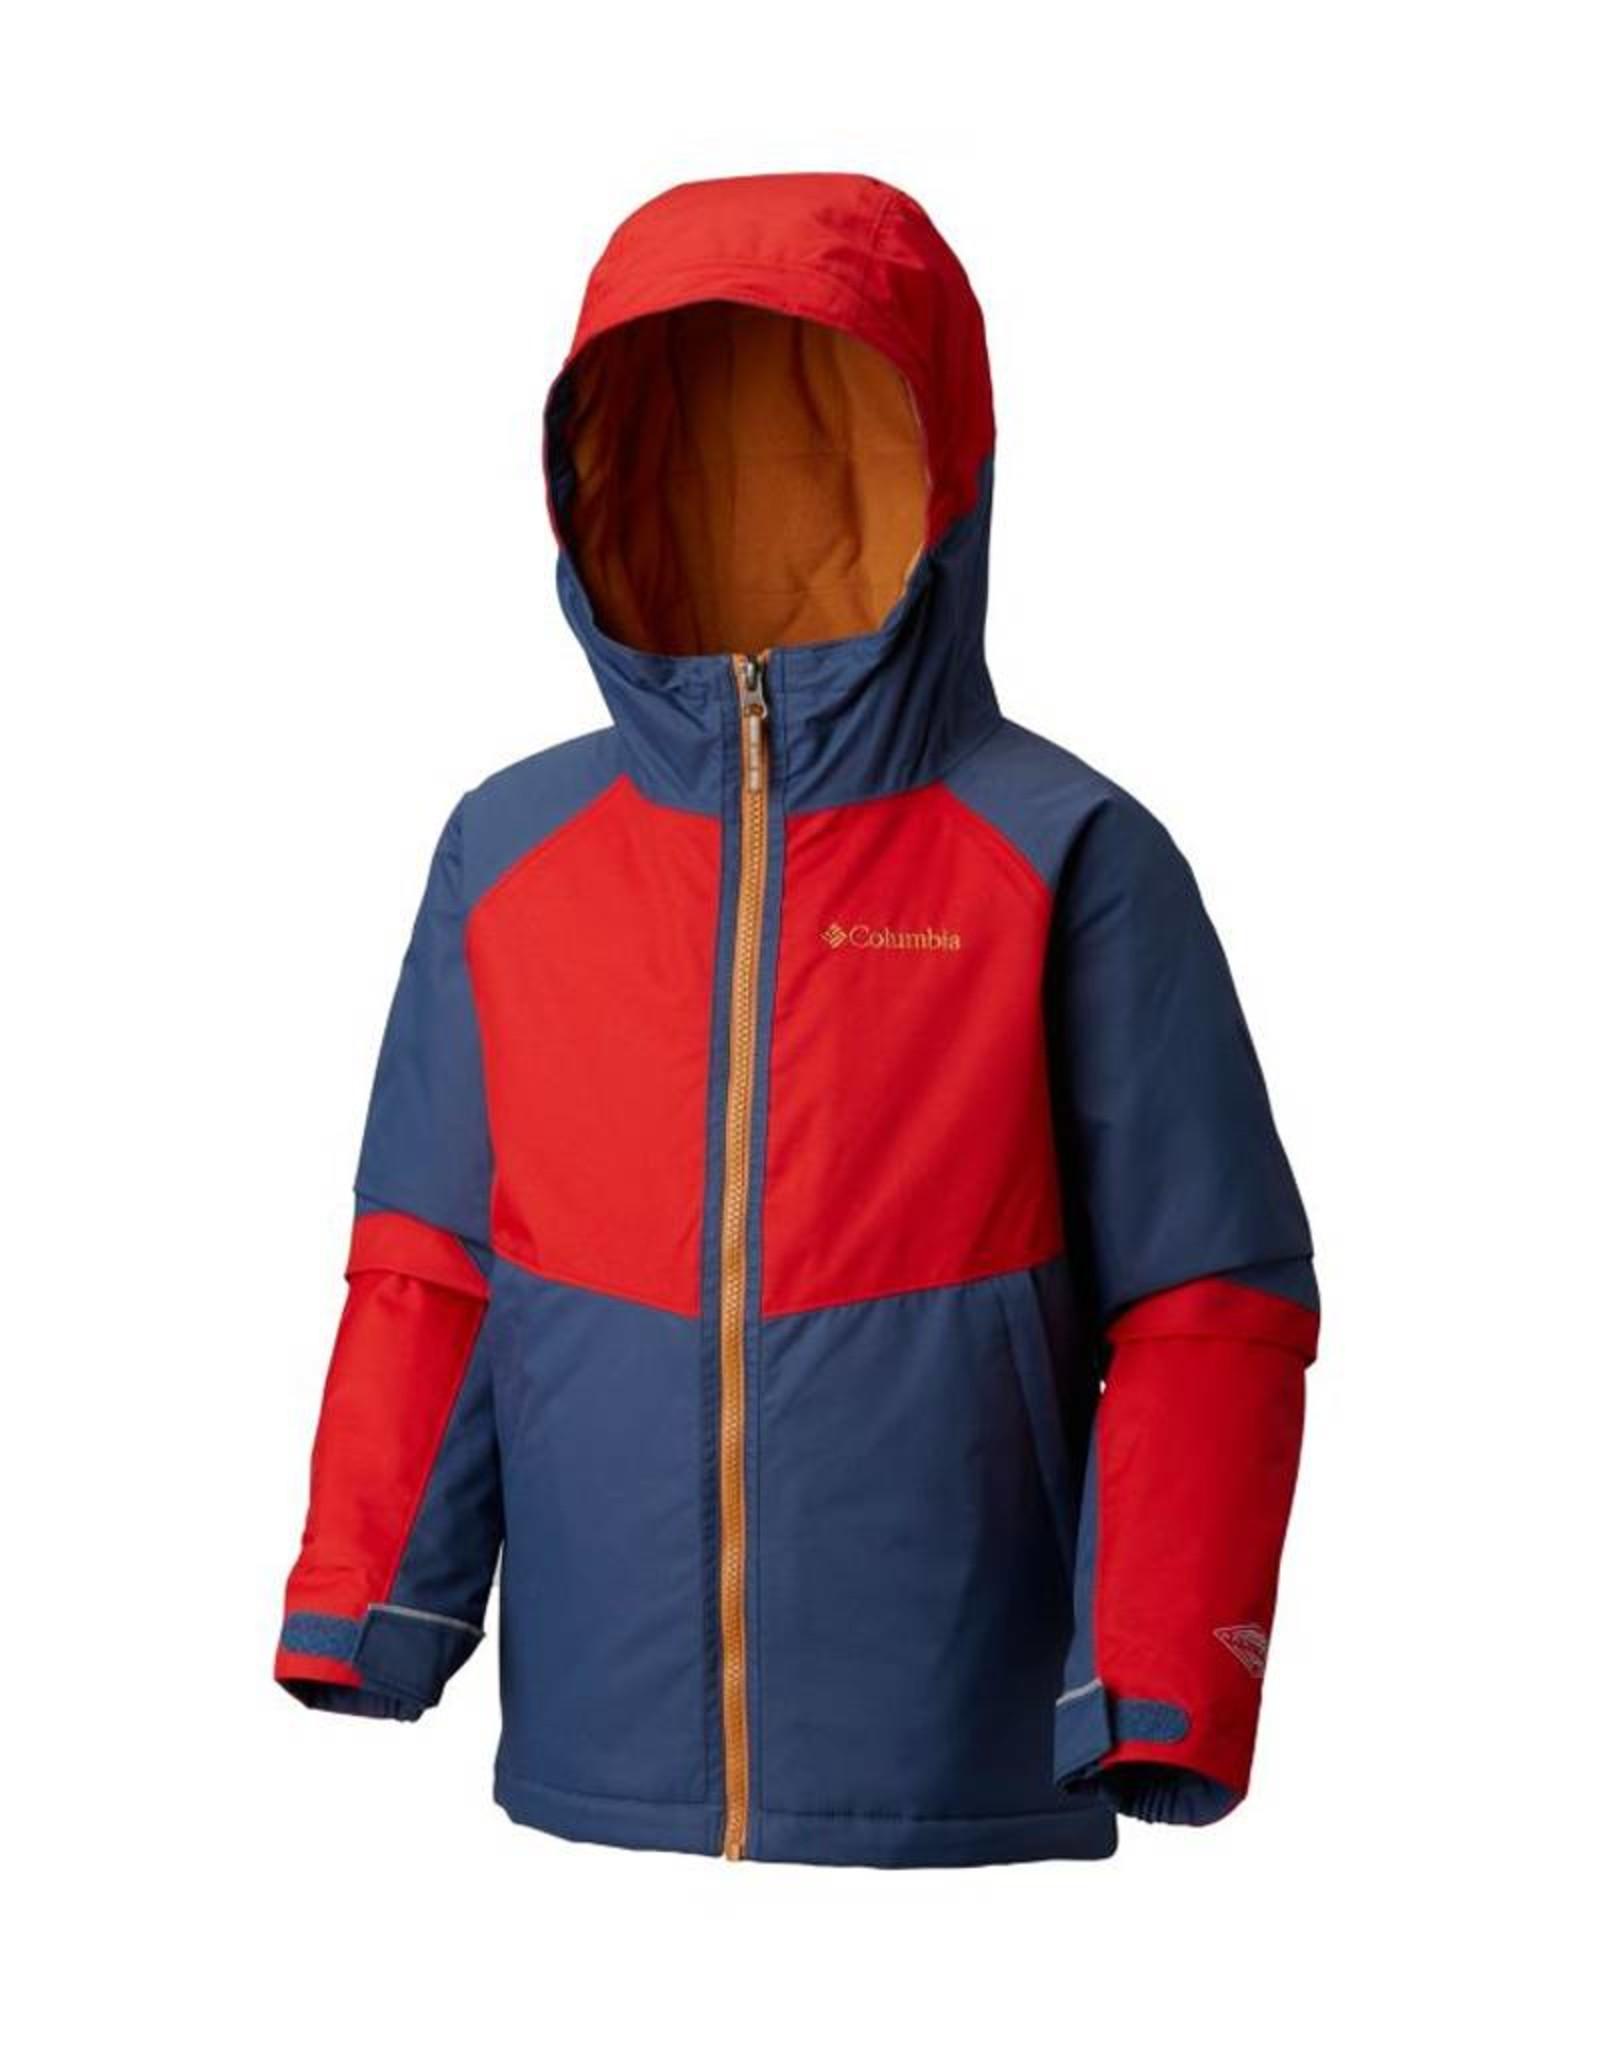 Columbia Alpine Action ll Jacket JR